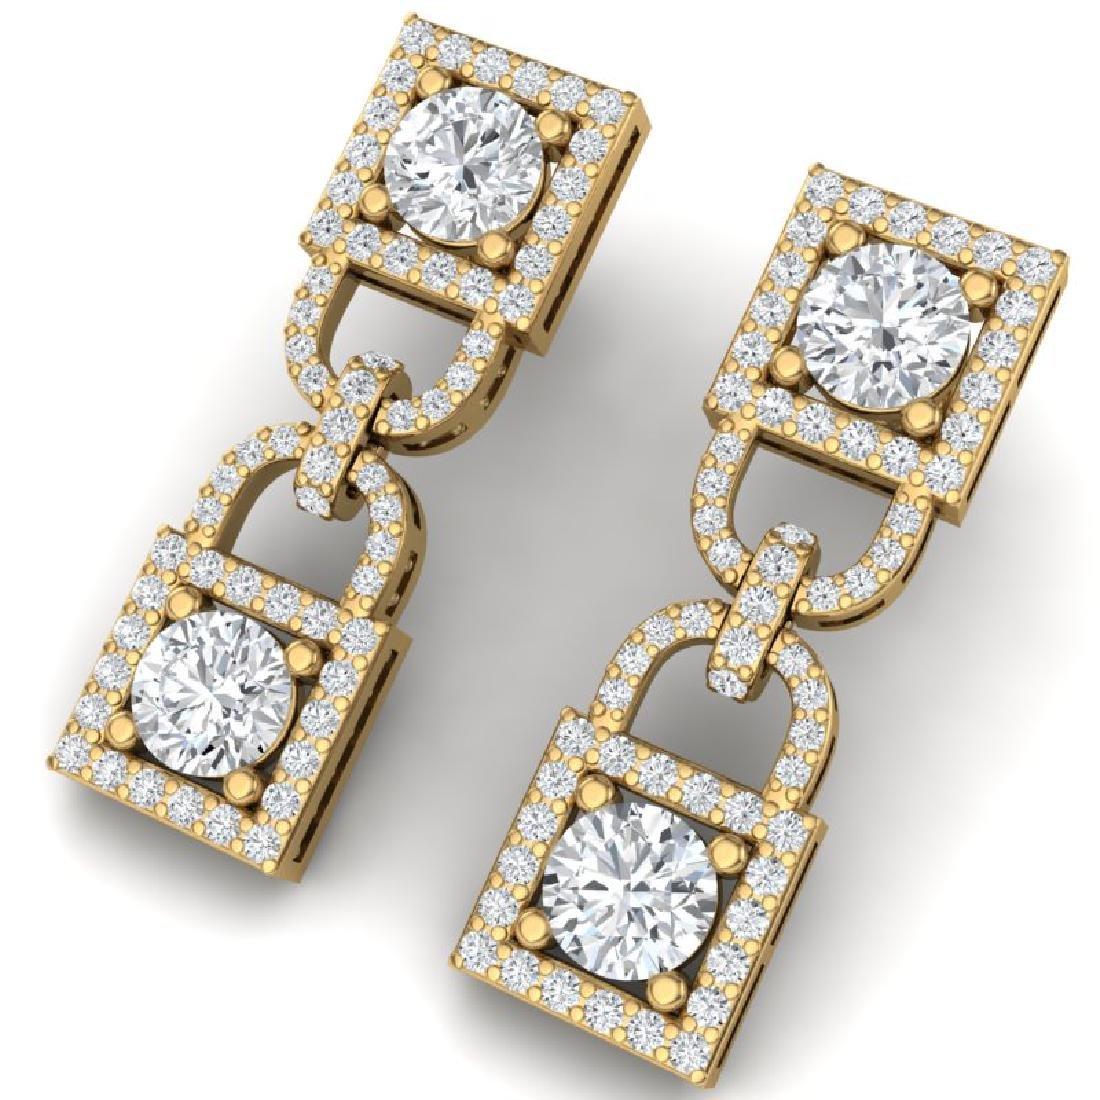 4 CTW Certified SI/I Diamond Halo Earrings 18K Yellow